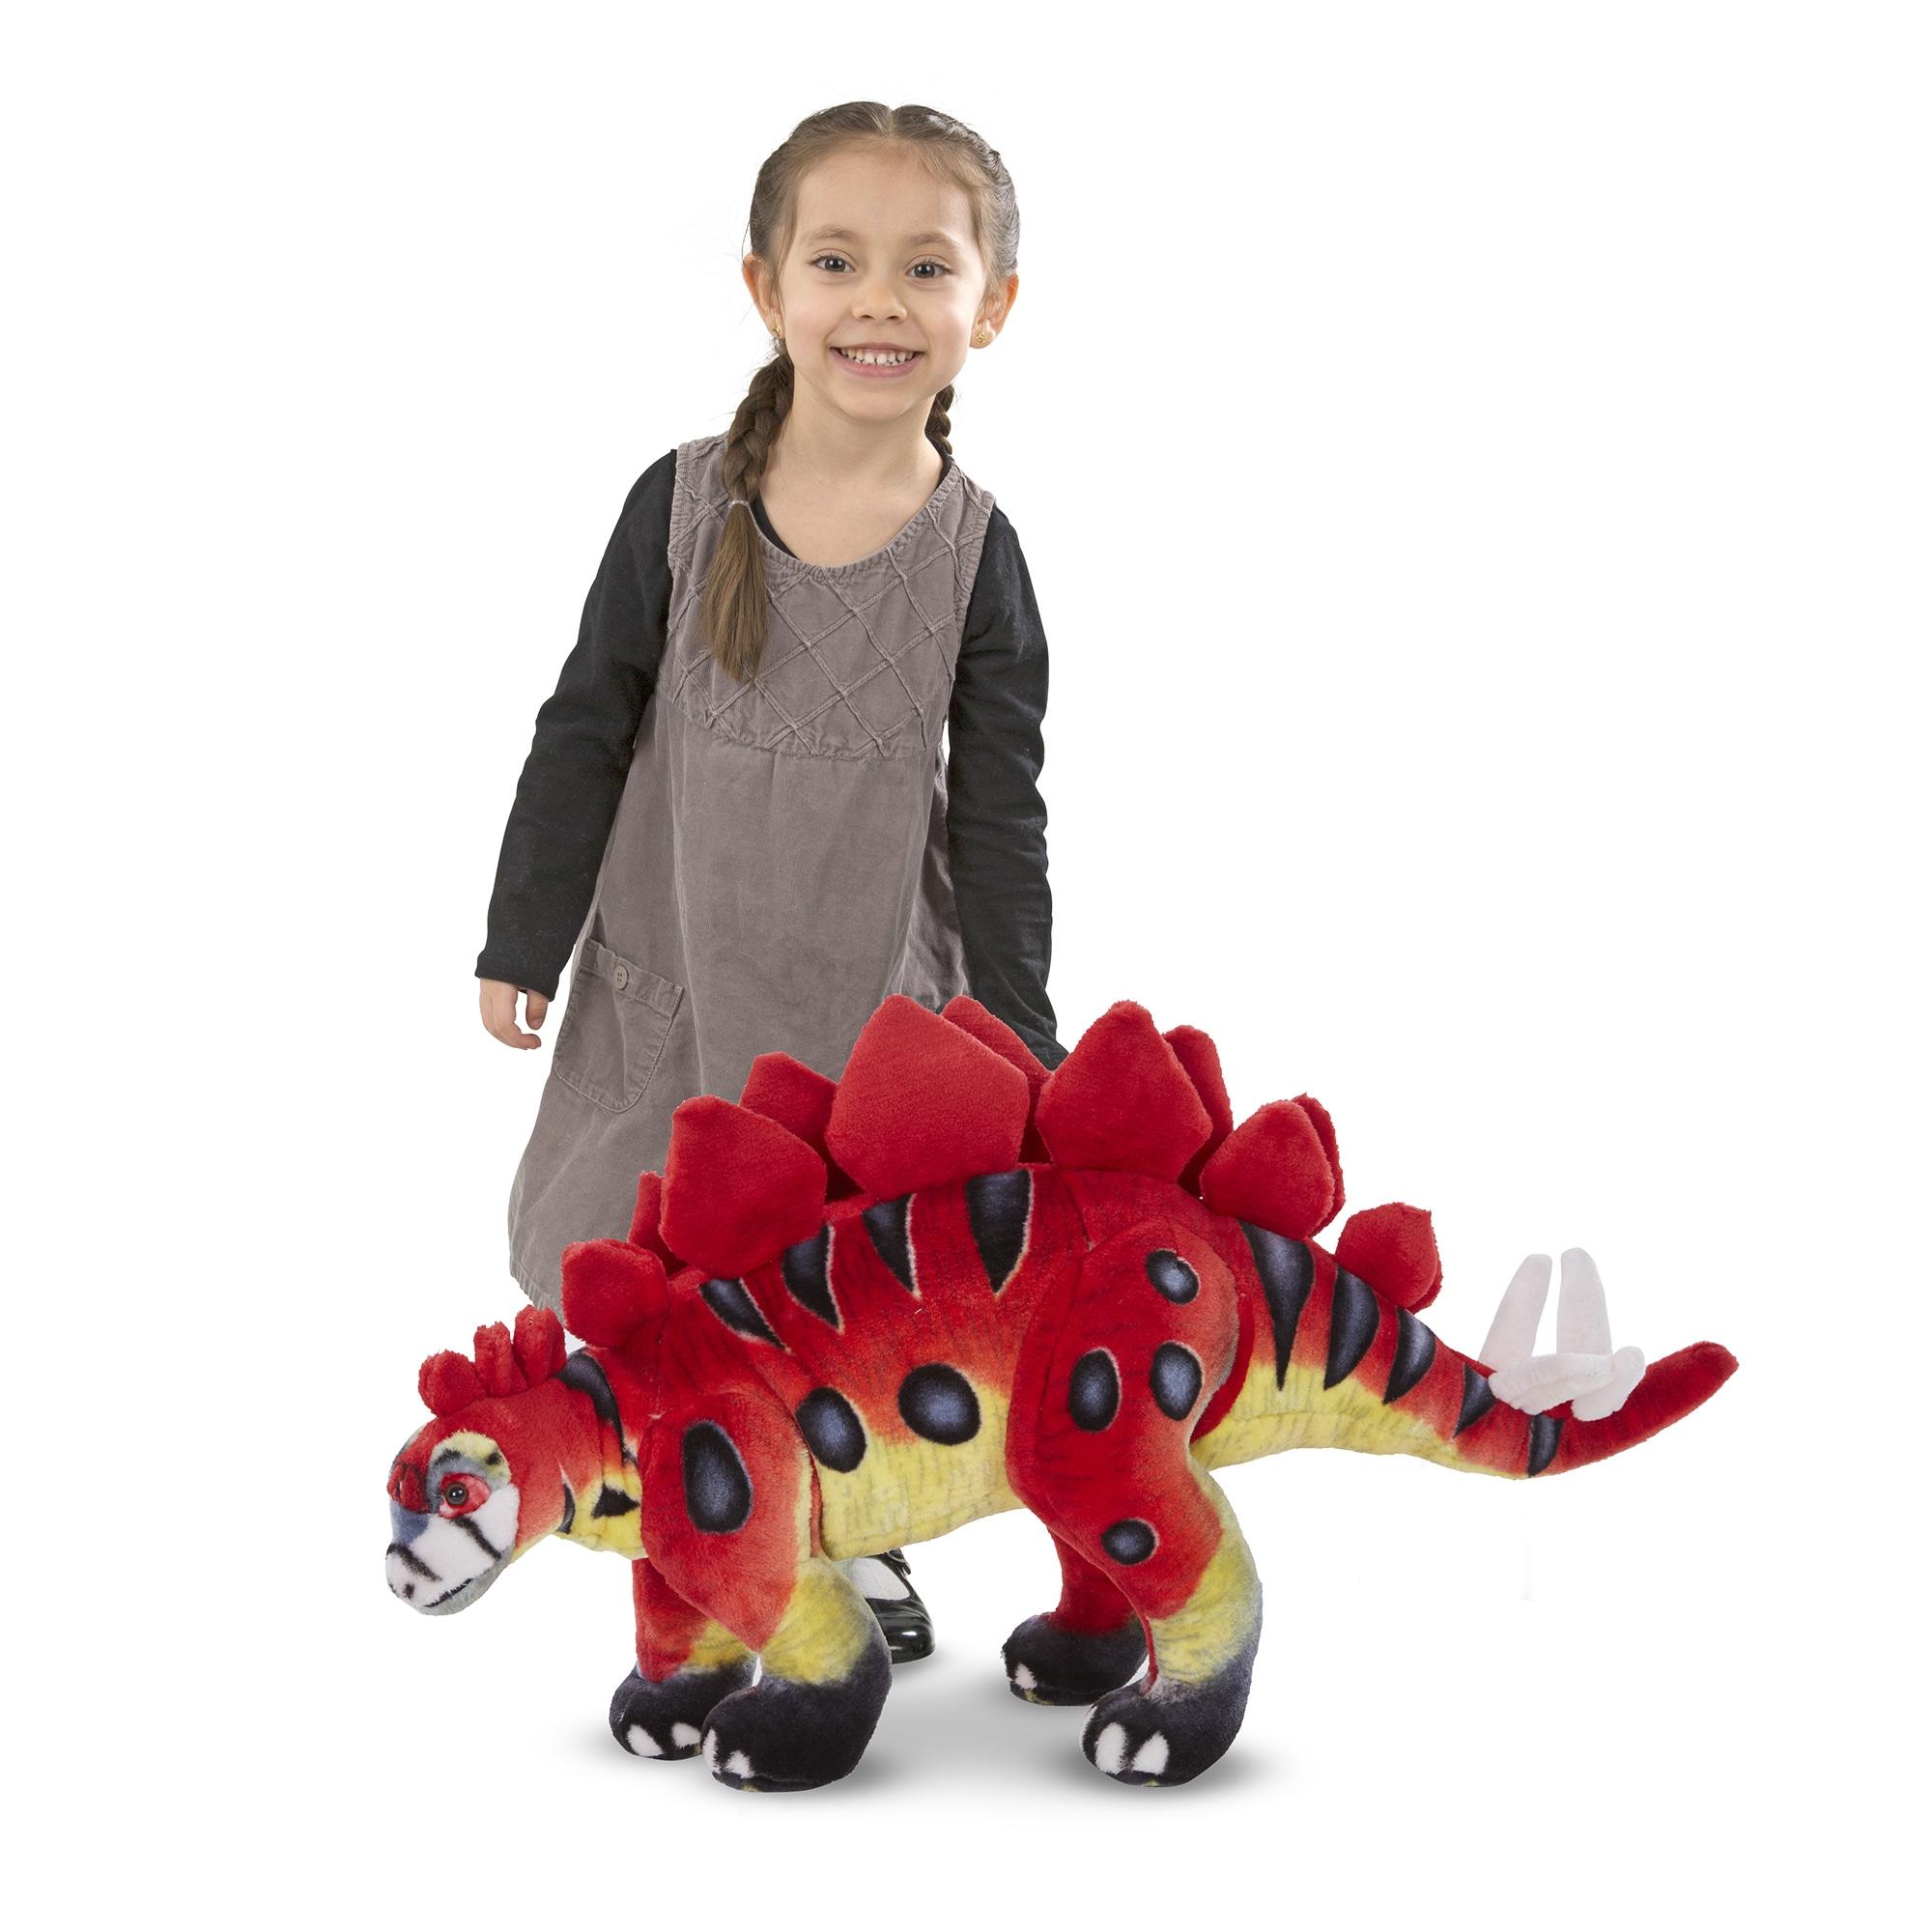 Melissa and Doug Stegosaurus Giant Stuffed Animal (Multi)...